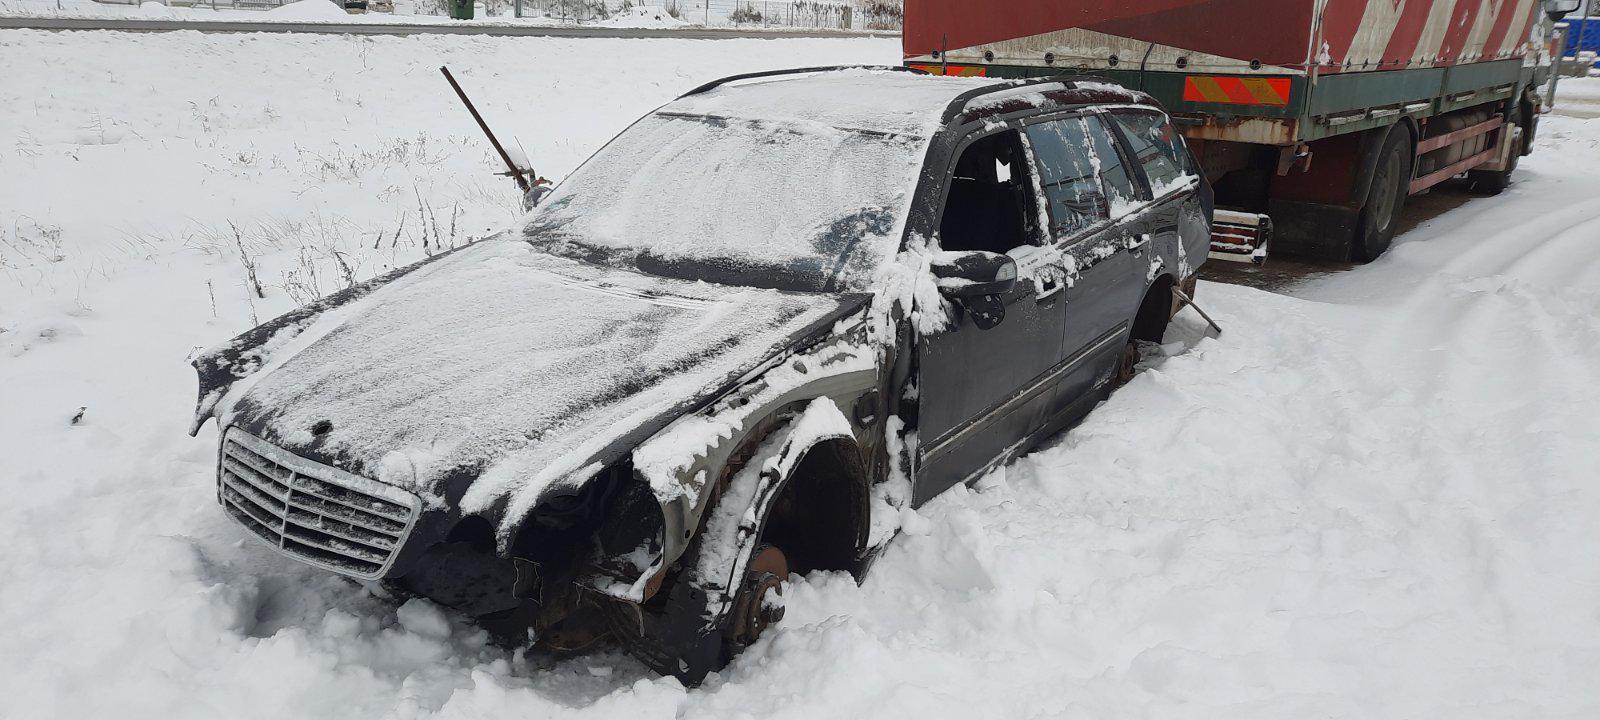 Used Car Parts Foto 2 Mercedes-Benz E-CLASS 2000 0.0 Mechanical Universal 4/5 d. Black 2021-1-12 A6026